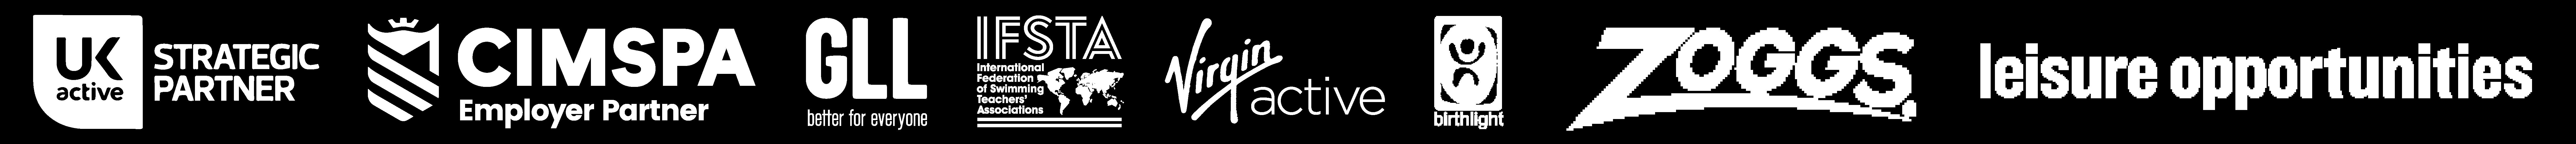 STA.co.uk